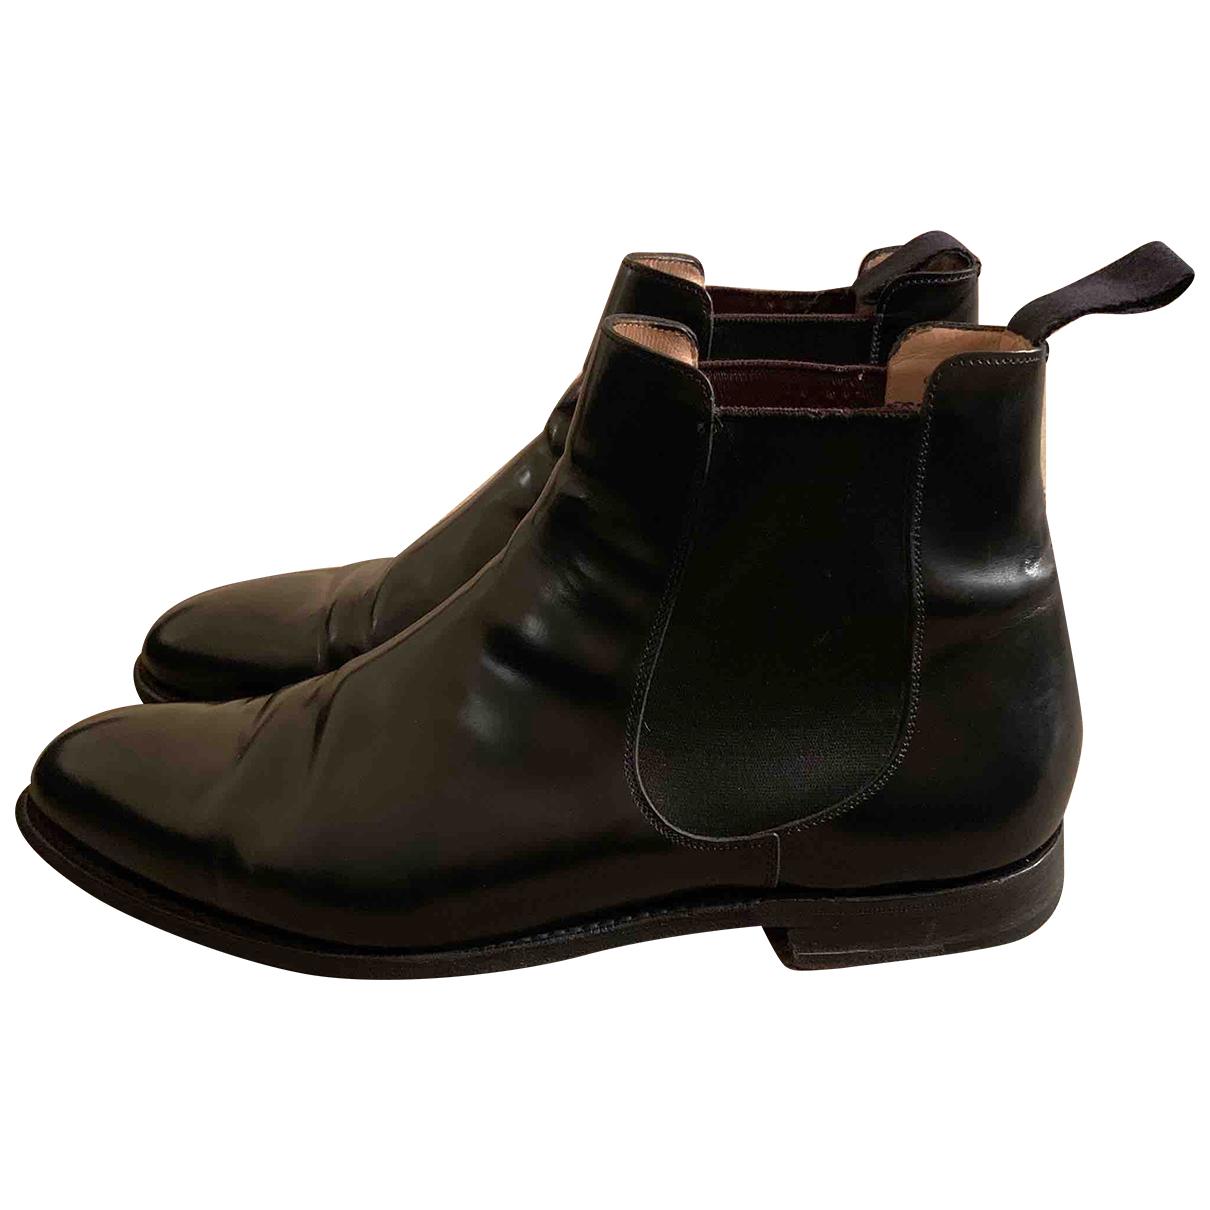 Churchs N Black Leather Boots for Men 9 UK